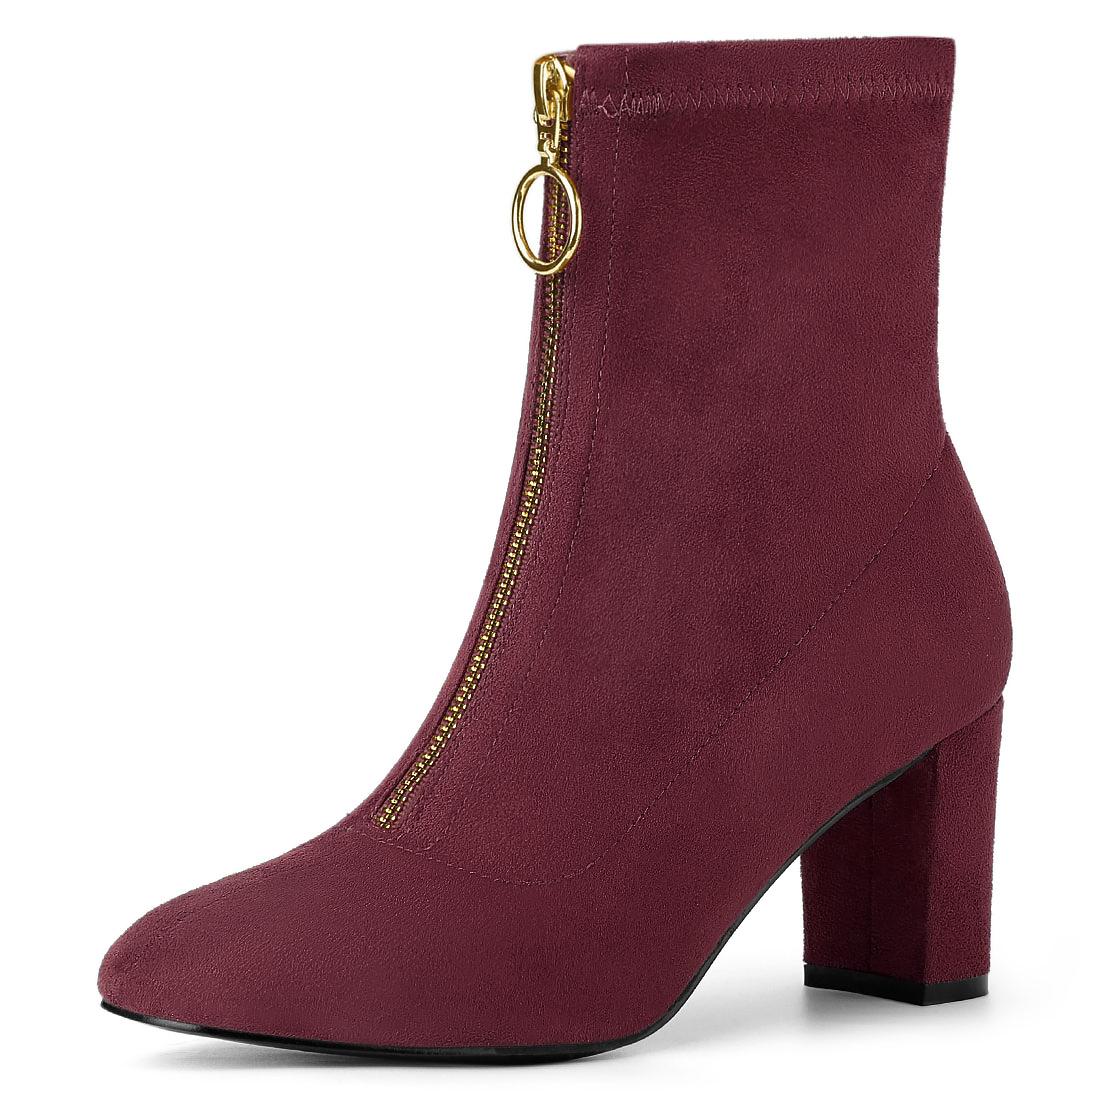 Allegra K Women's Front Zipper Chunky Heel Ankle Boots Burgundy US 10